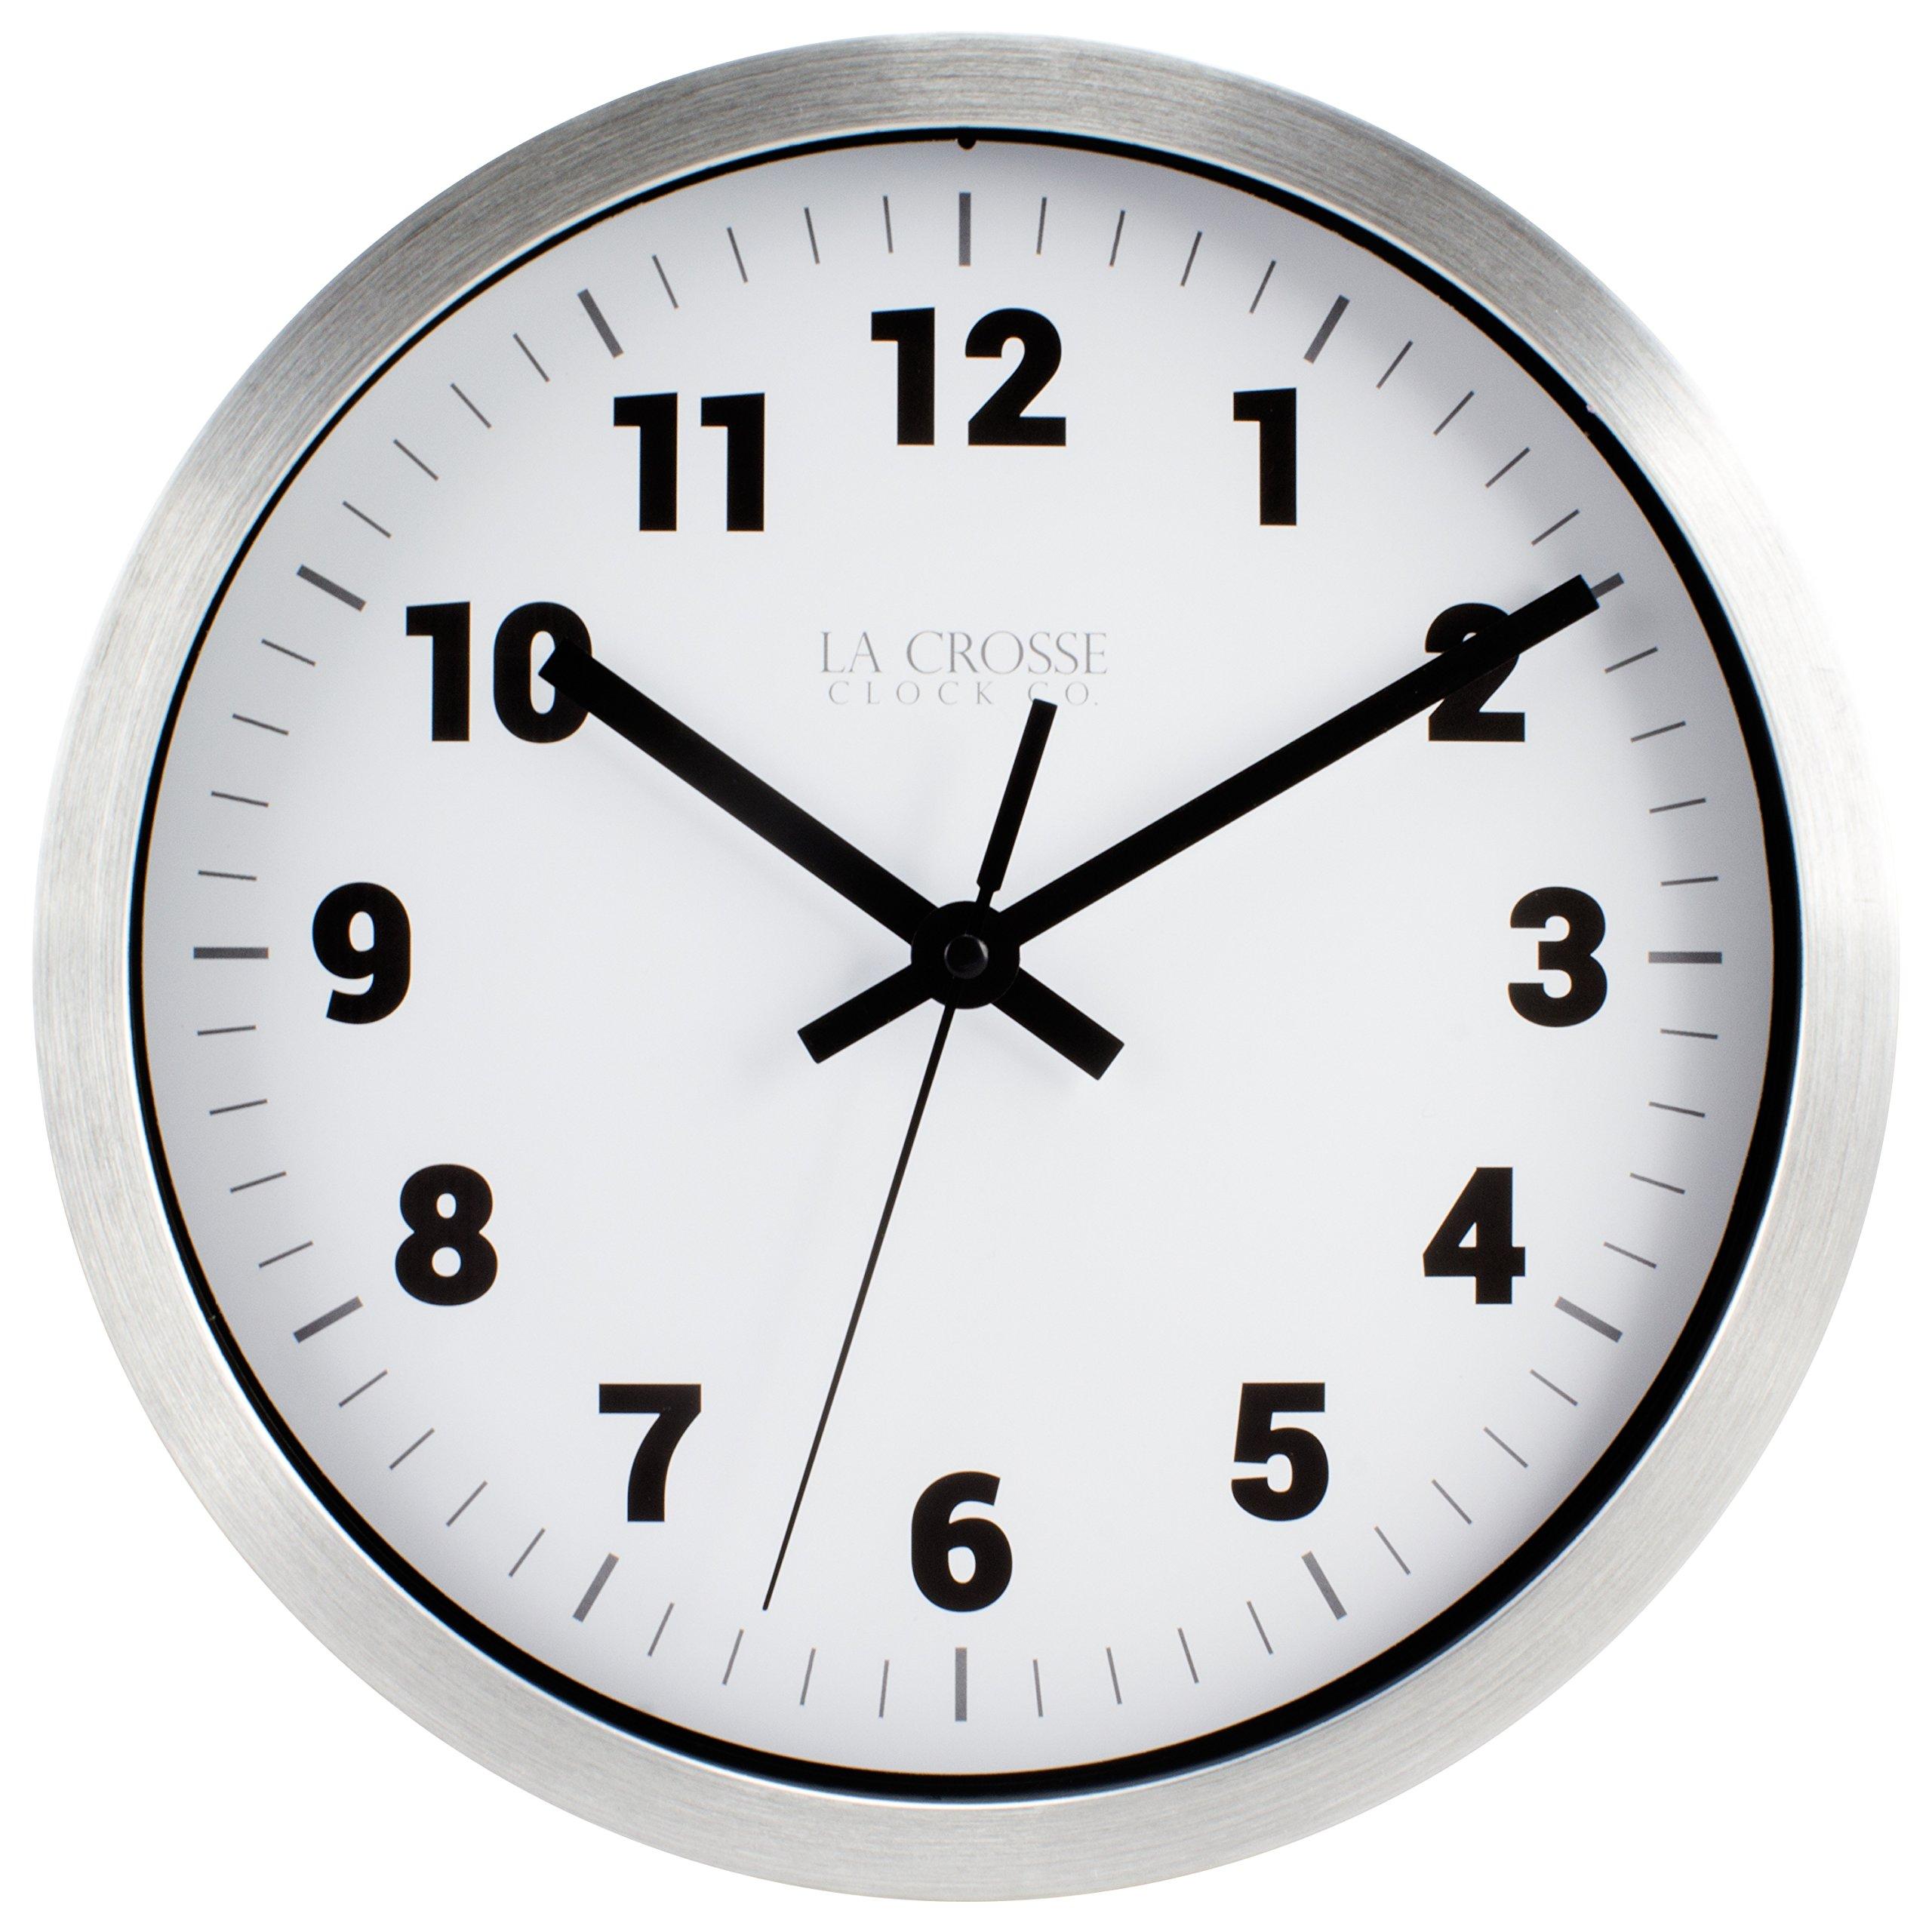 La Crosse Technology 404-2626 La Crosse Clock 10 in Silver Metal Analog Wall Clock with White Dial